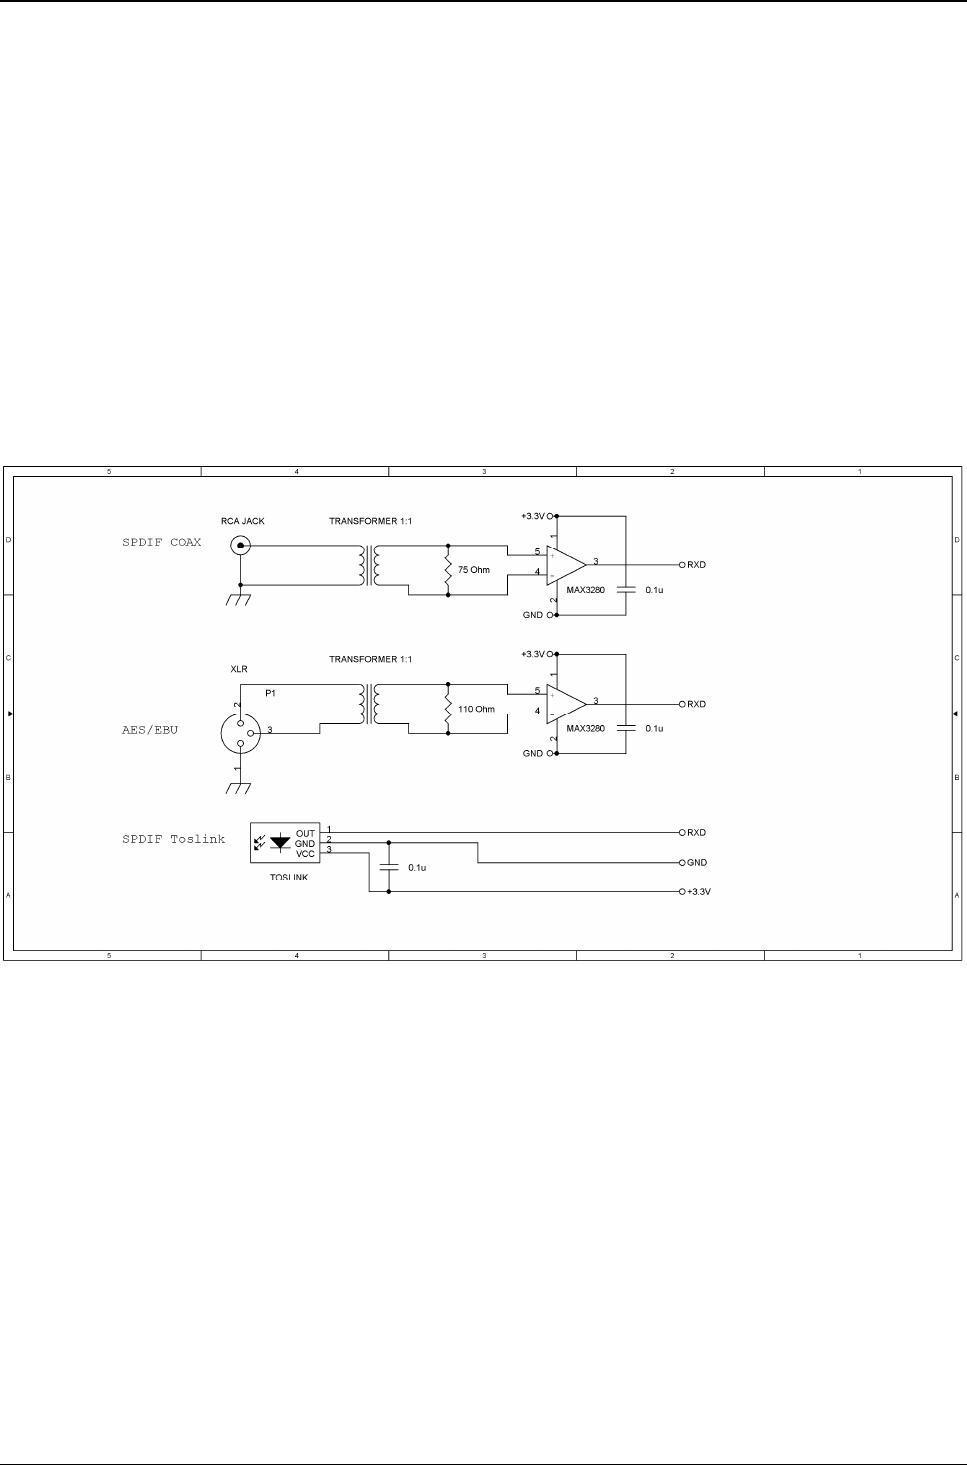 DAC Technologies dam1121 Manual Download - Page 5